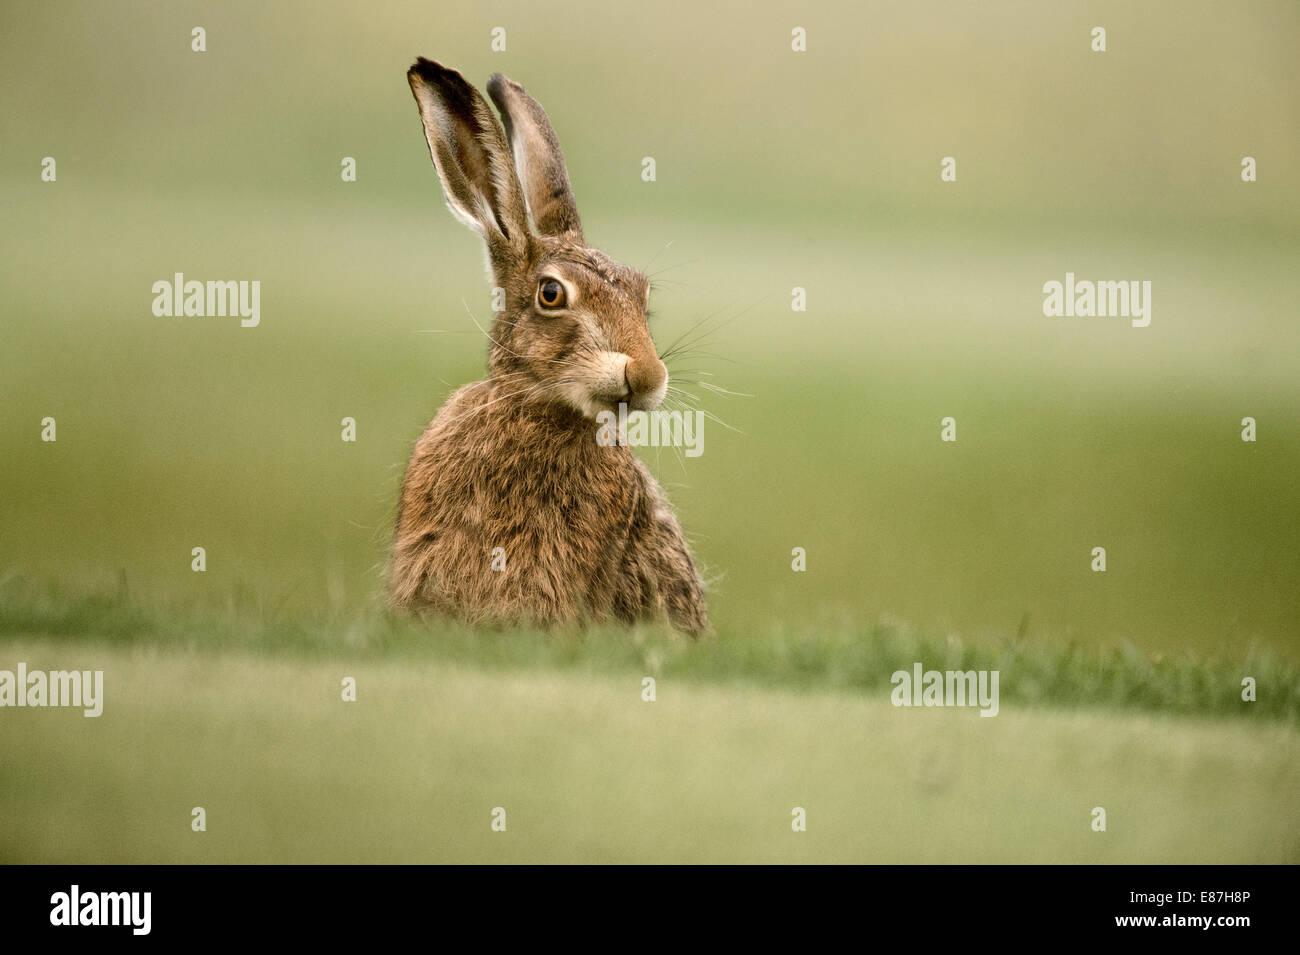 European Brown Hare, Lepus europaeus - Stock Image